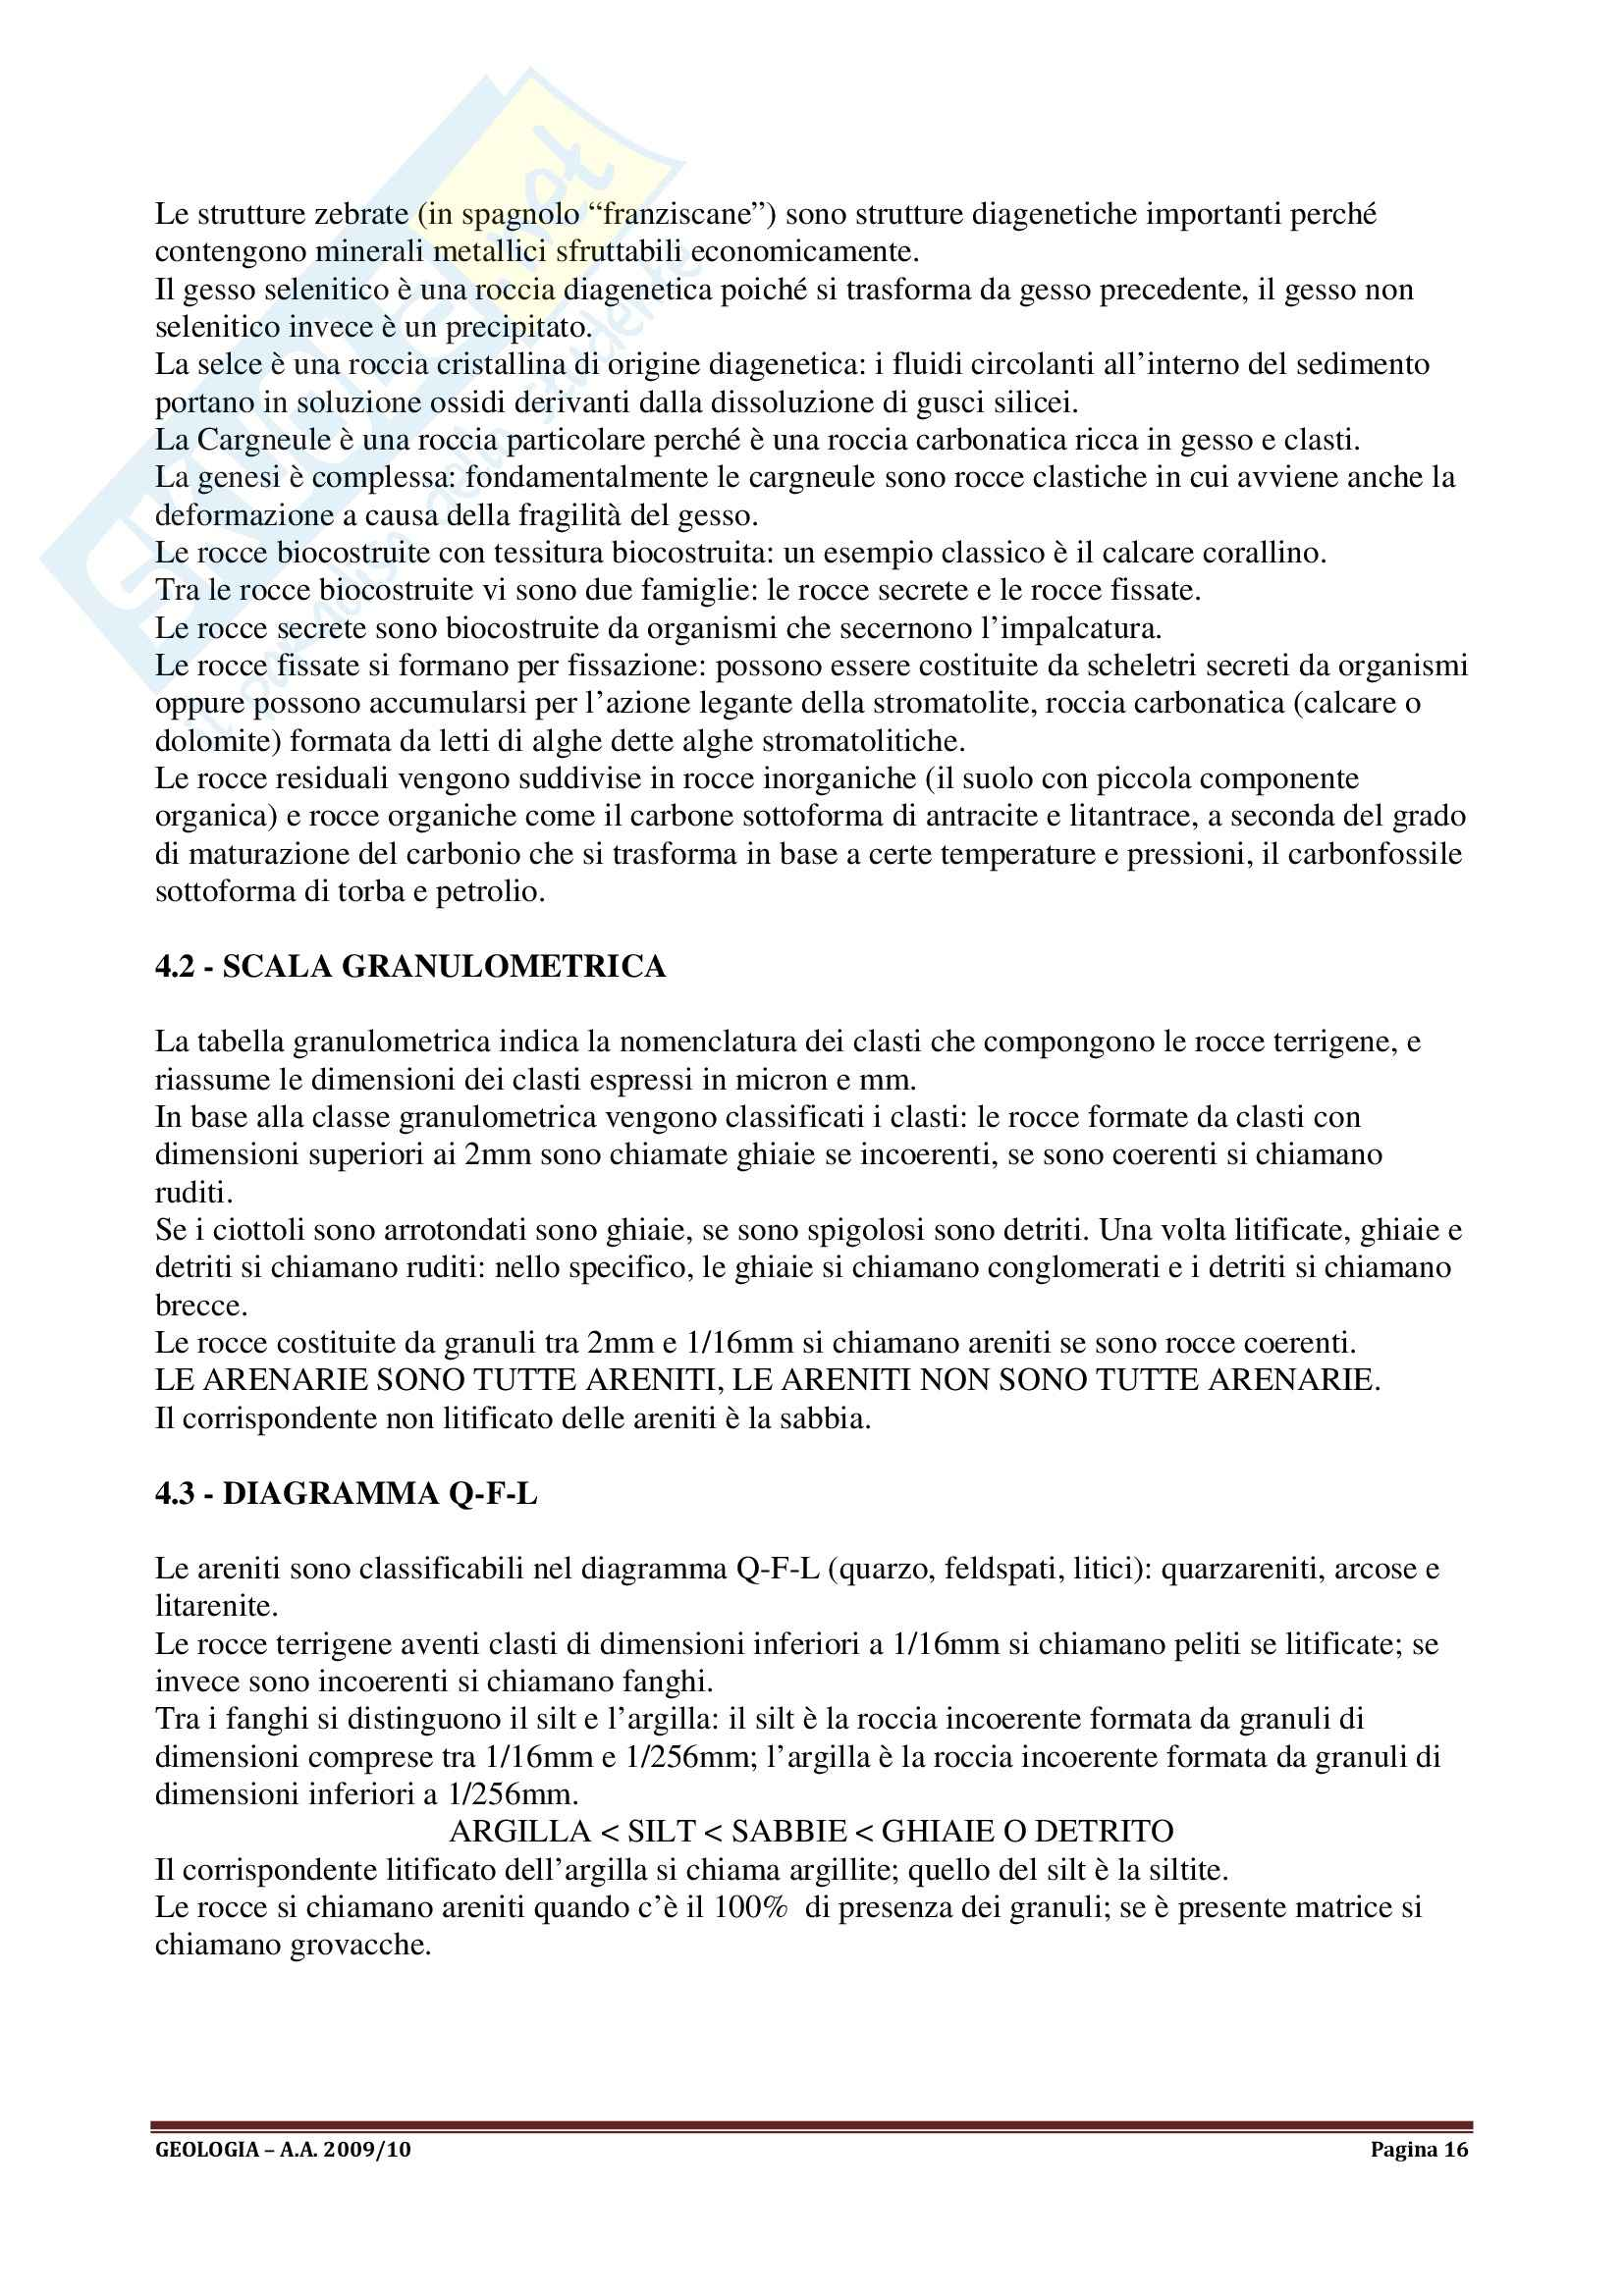 Geologia I - Appunti Pag. 16